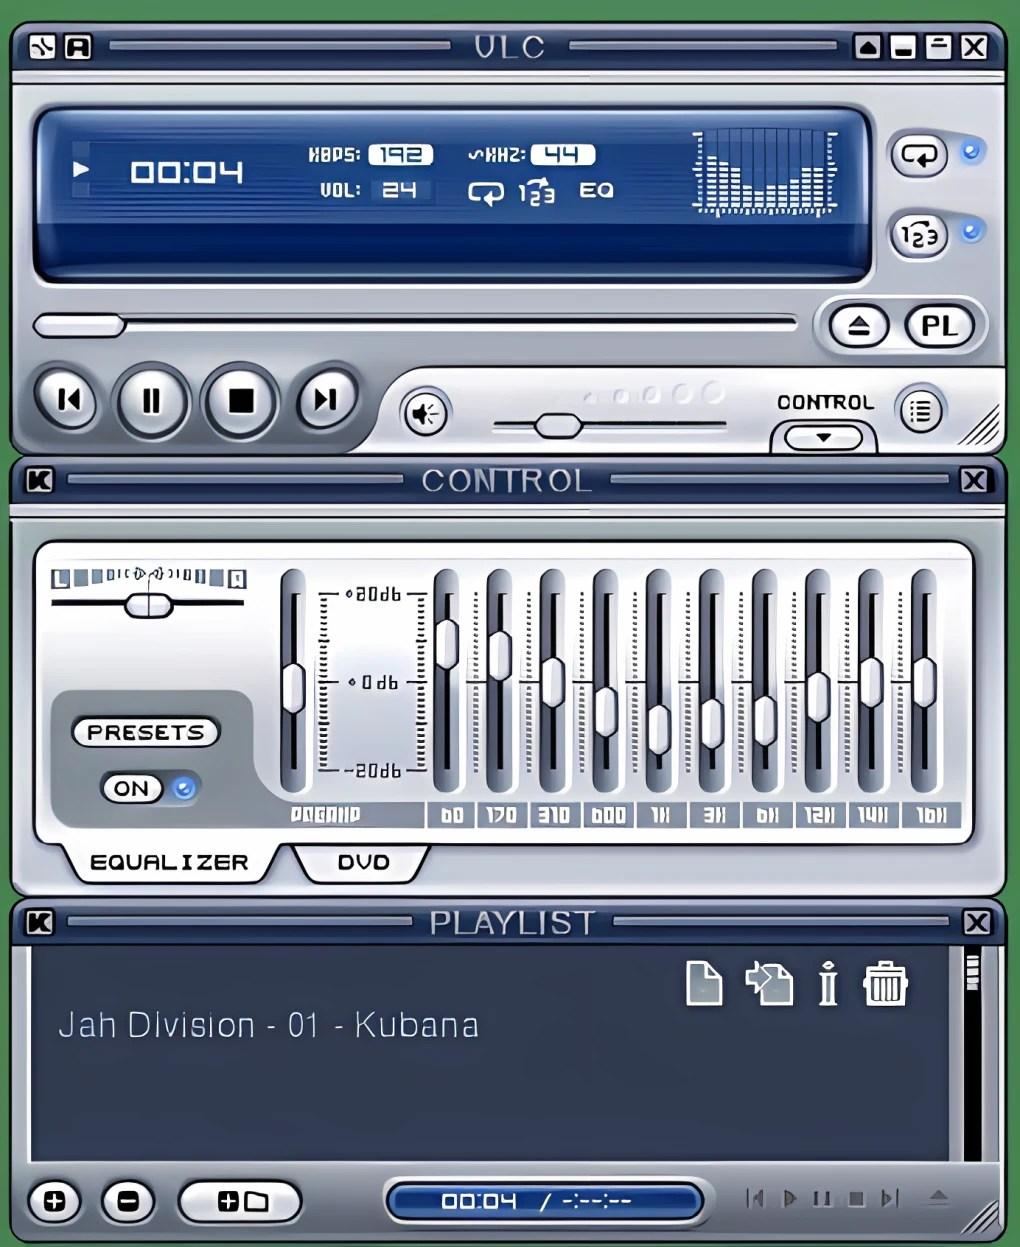 Vlc Download 64 Bit For Pc : download, Media, Player, Skins, Download